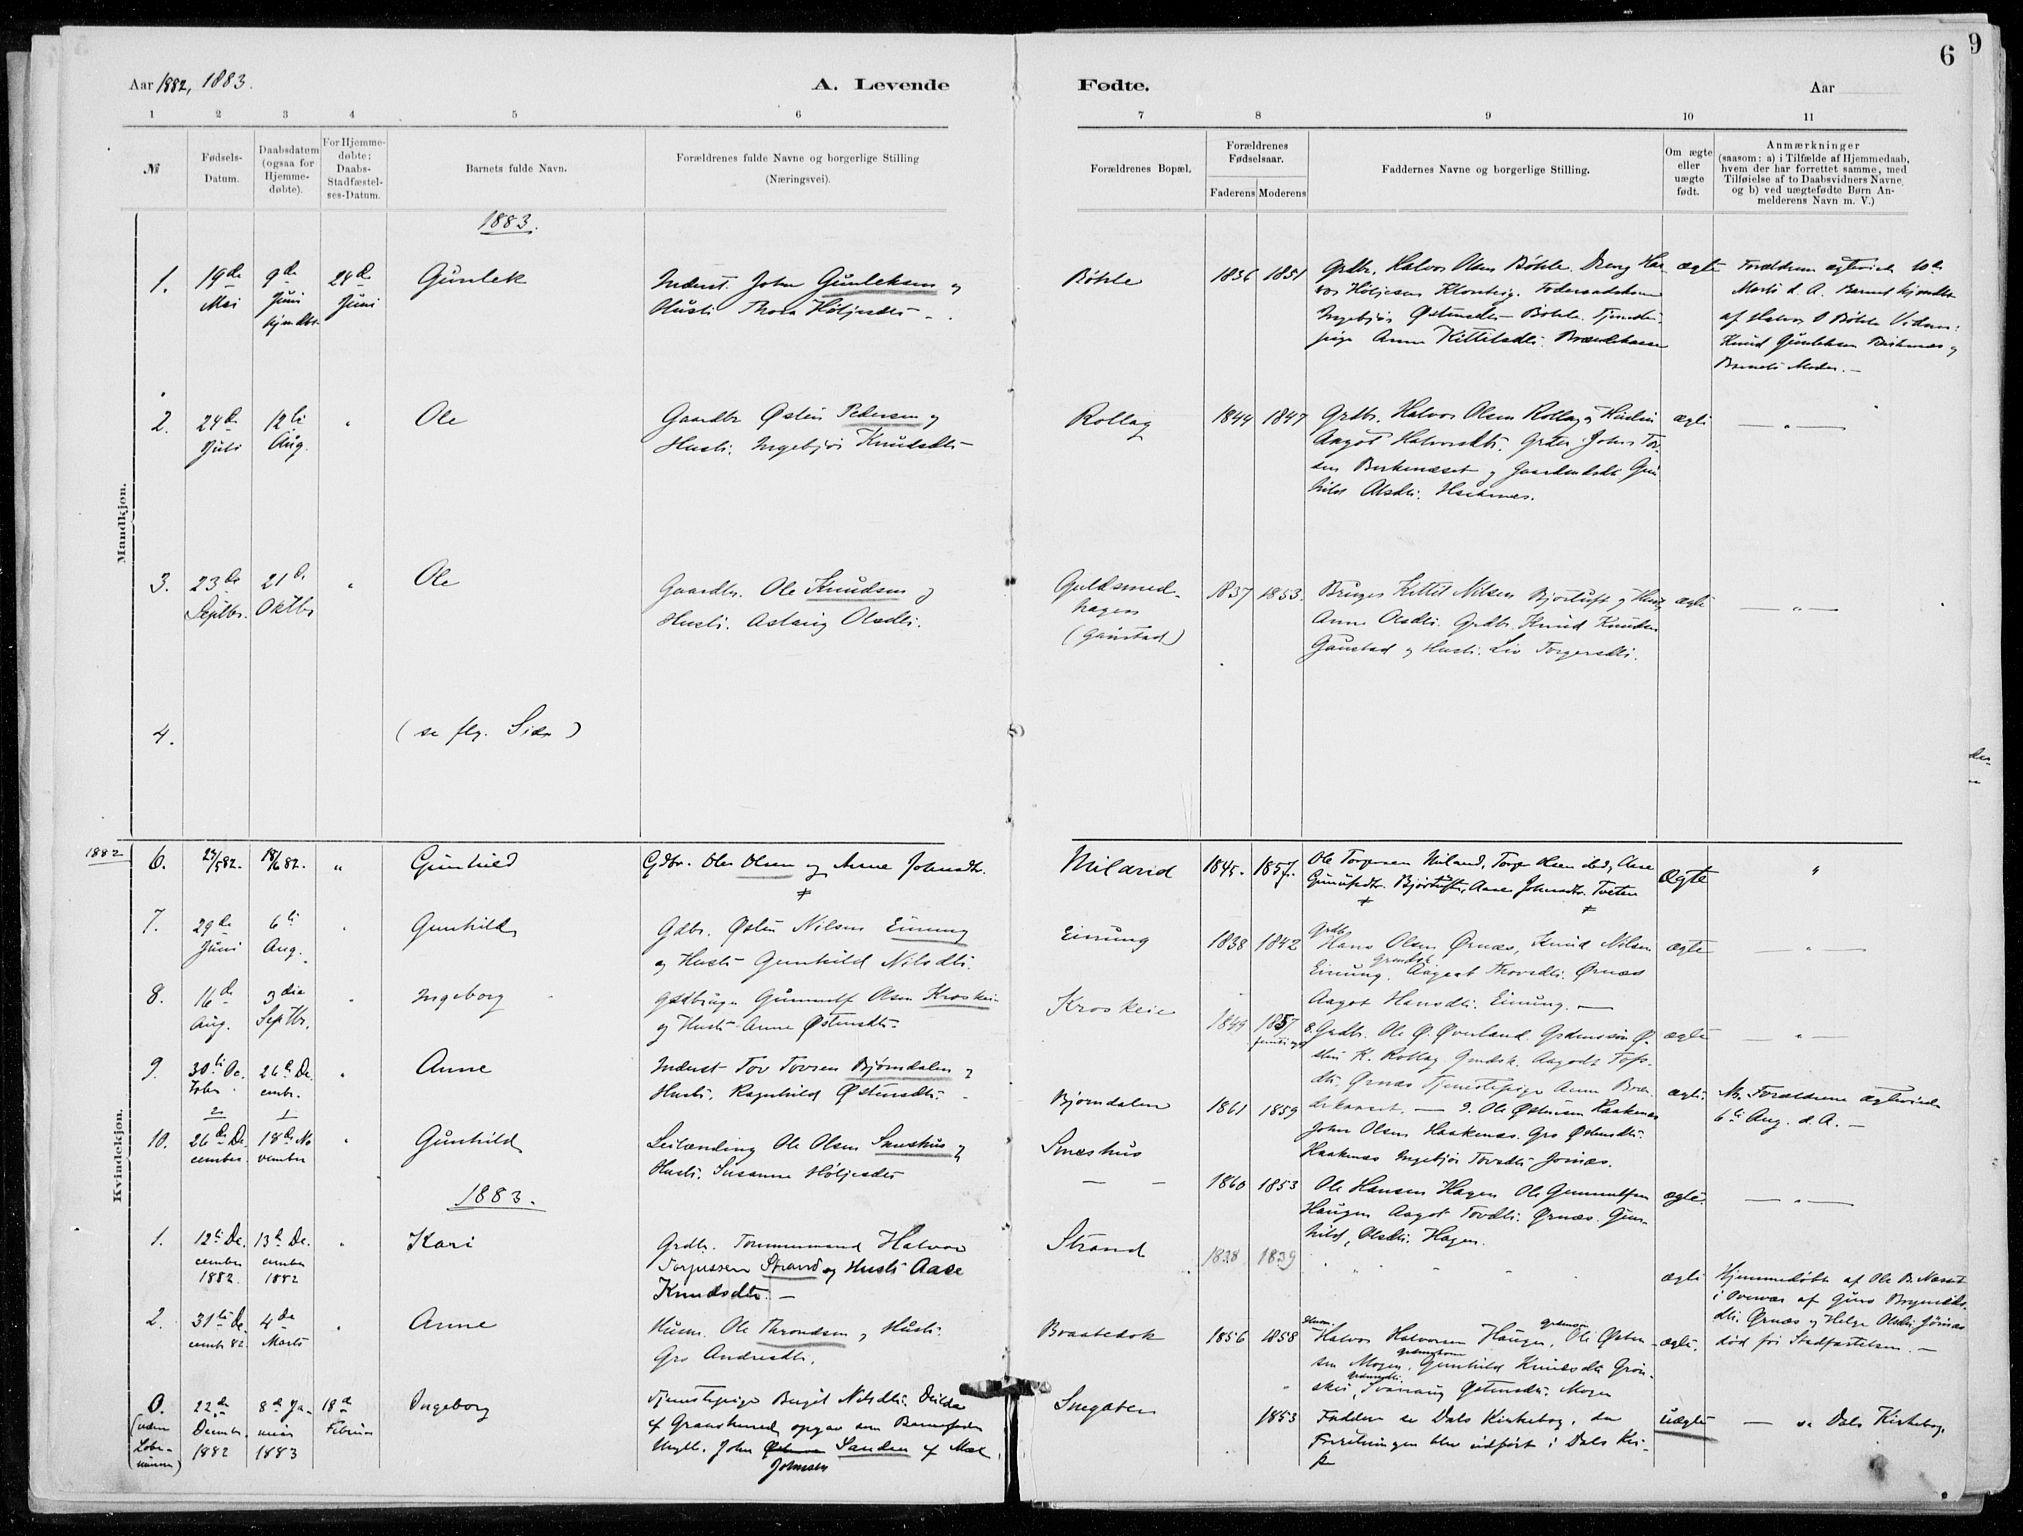 SAKO, Tinn kirkebøker, F/Fb/L0002: Ministerialbok nr. II 2, 1878-1917, s. 6